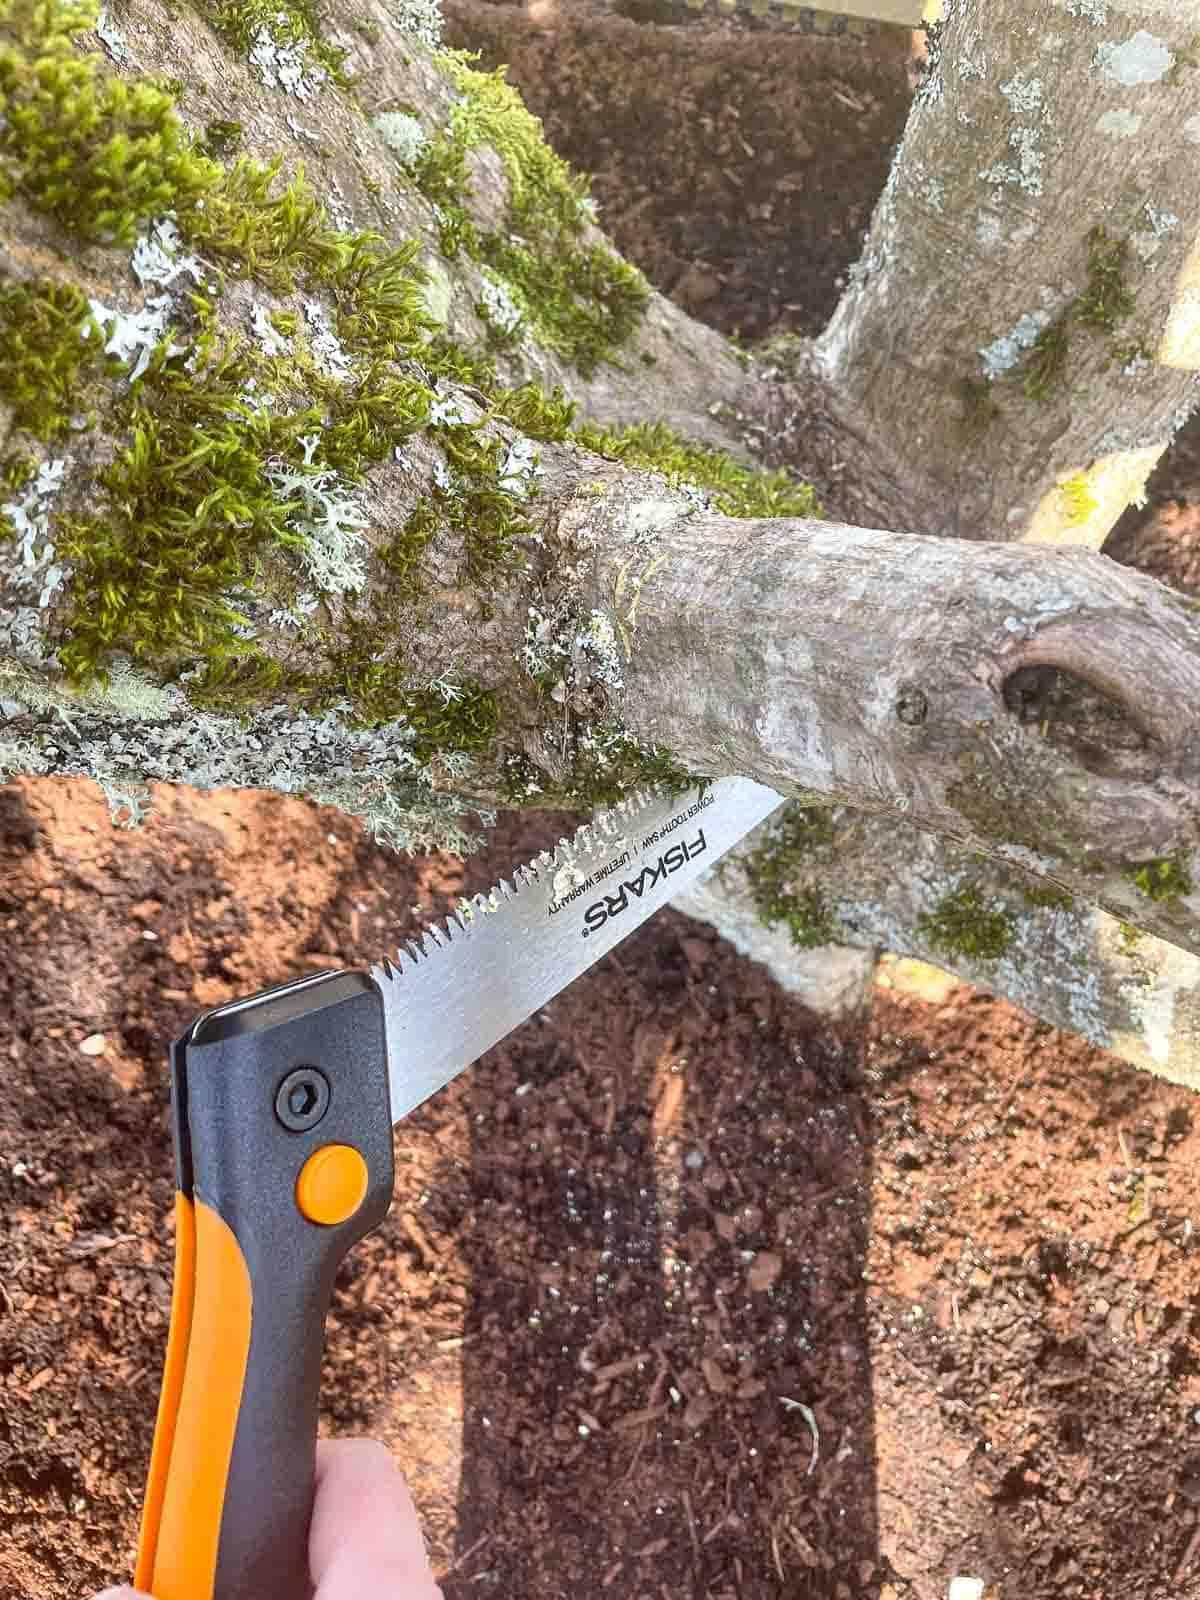 pruning saw cutting a branch